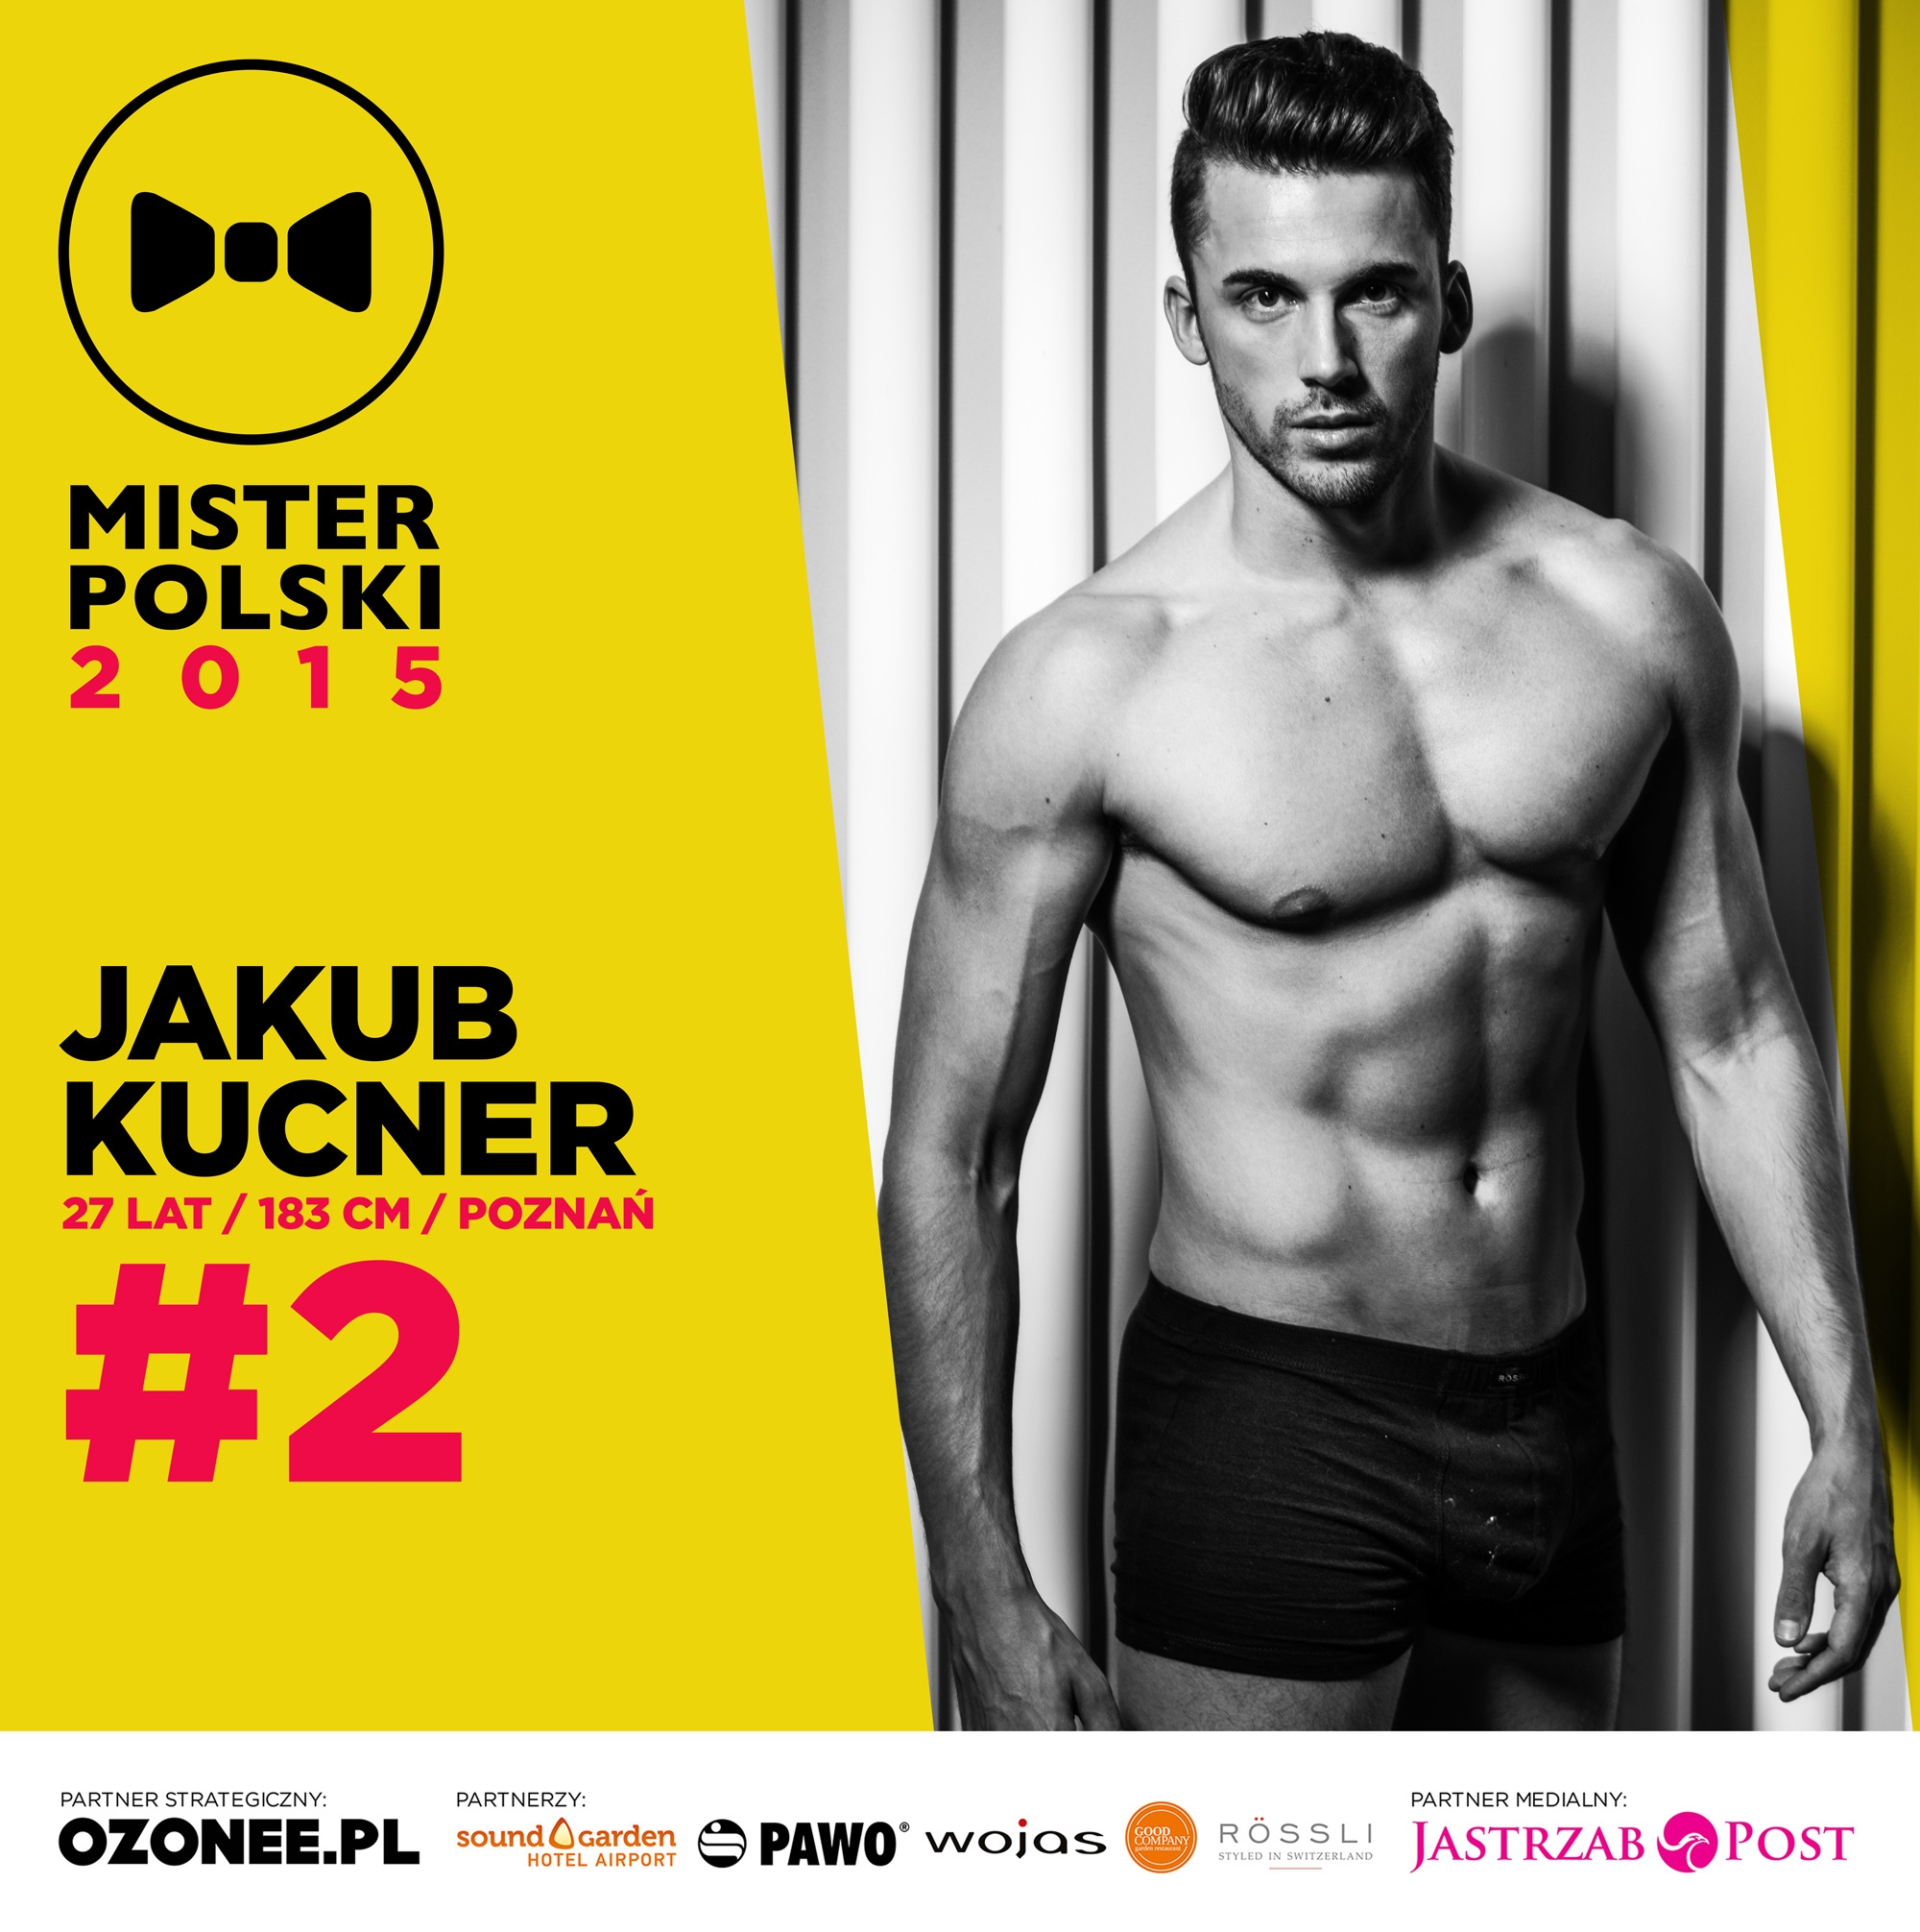 Jakub Kucner - nr 2 - Mister Polski 2015